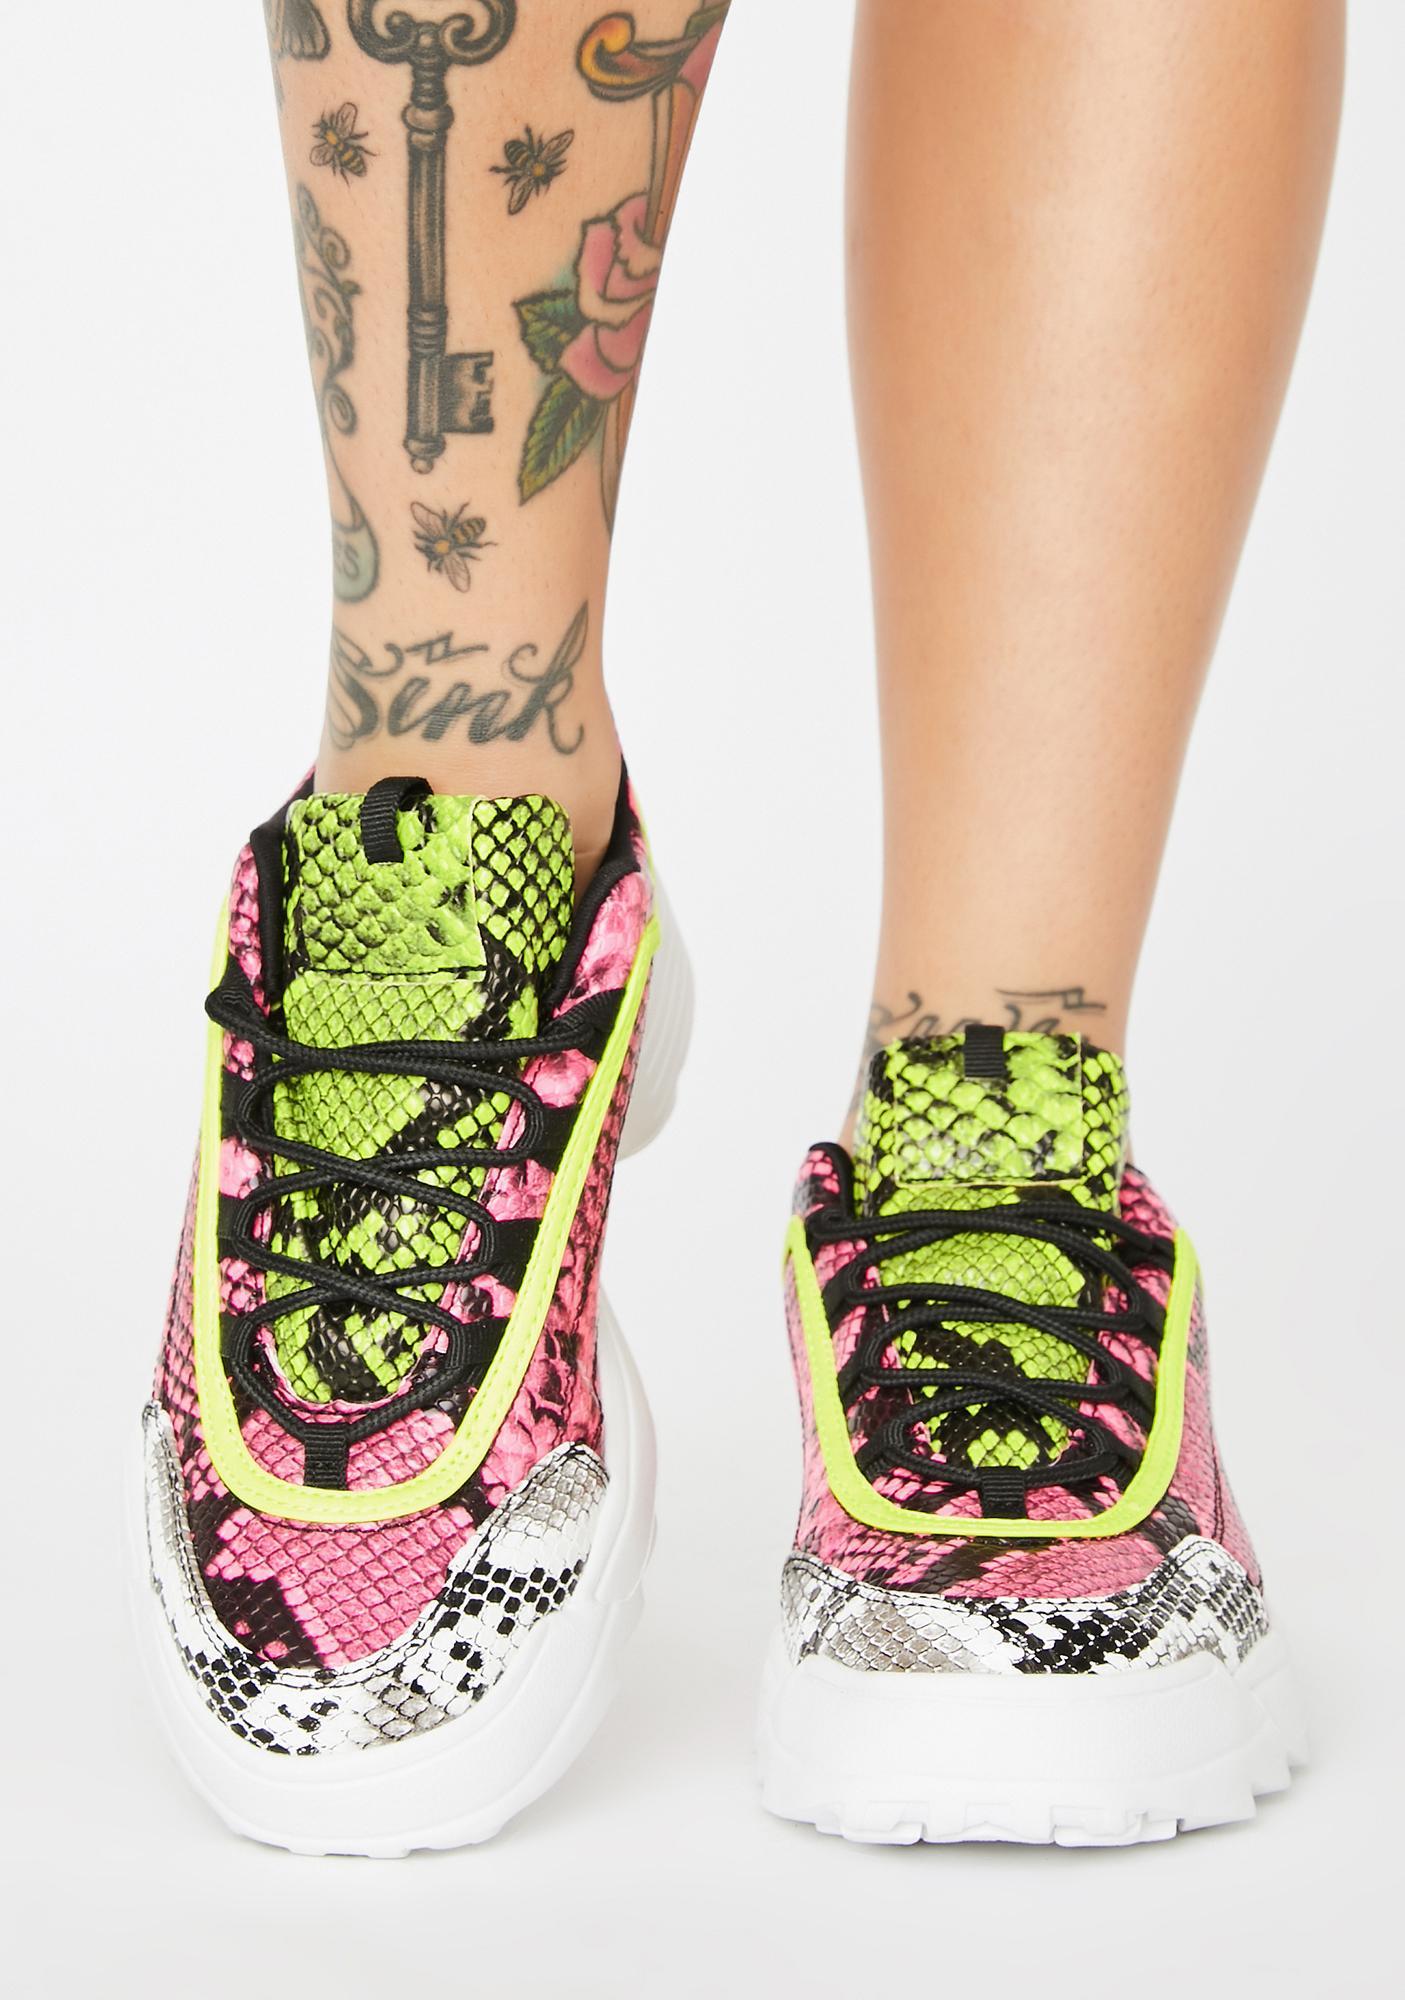 Sneak Freak Platform Sneakers